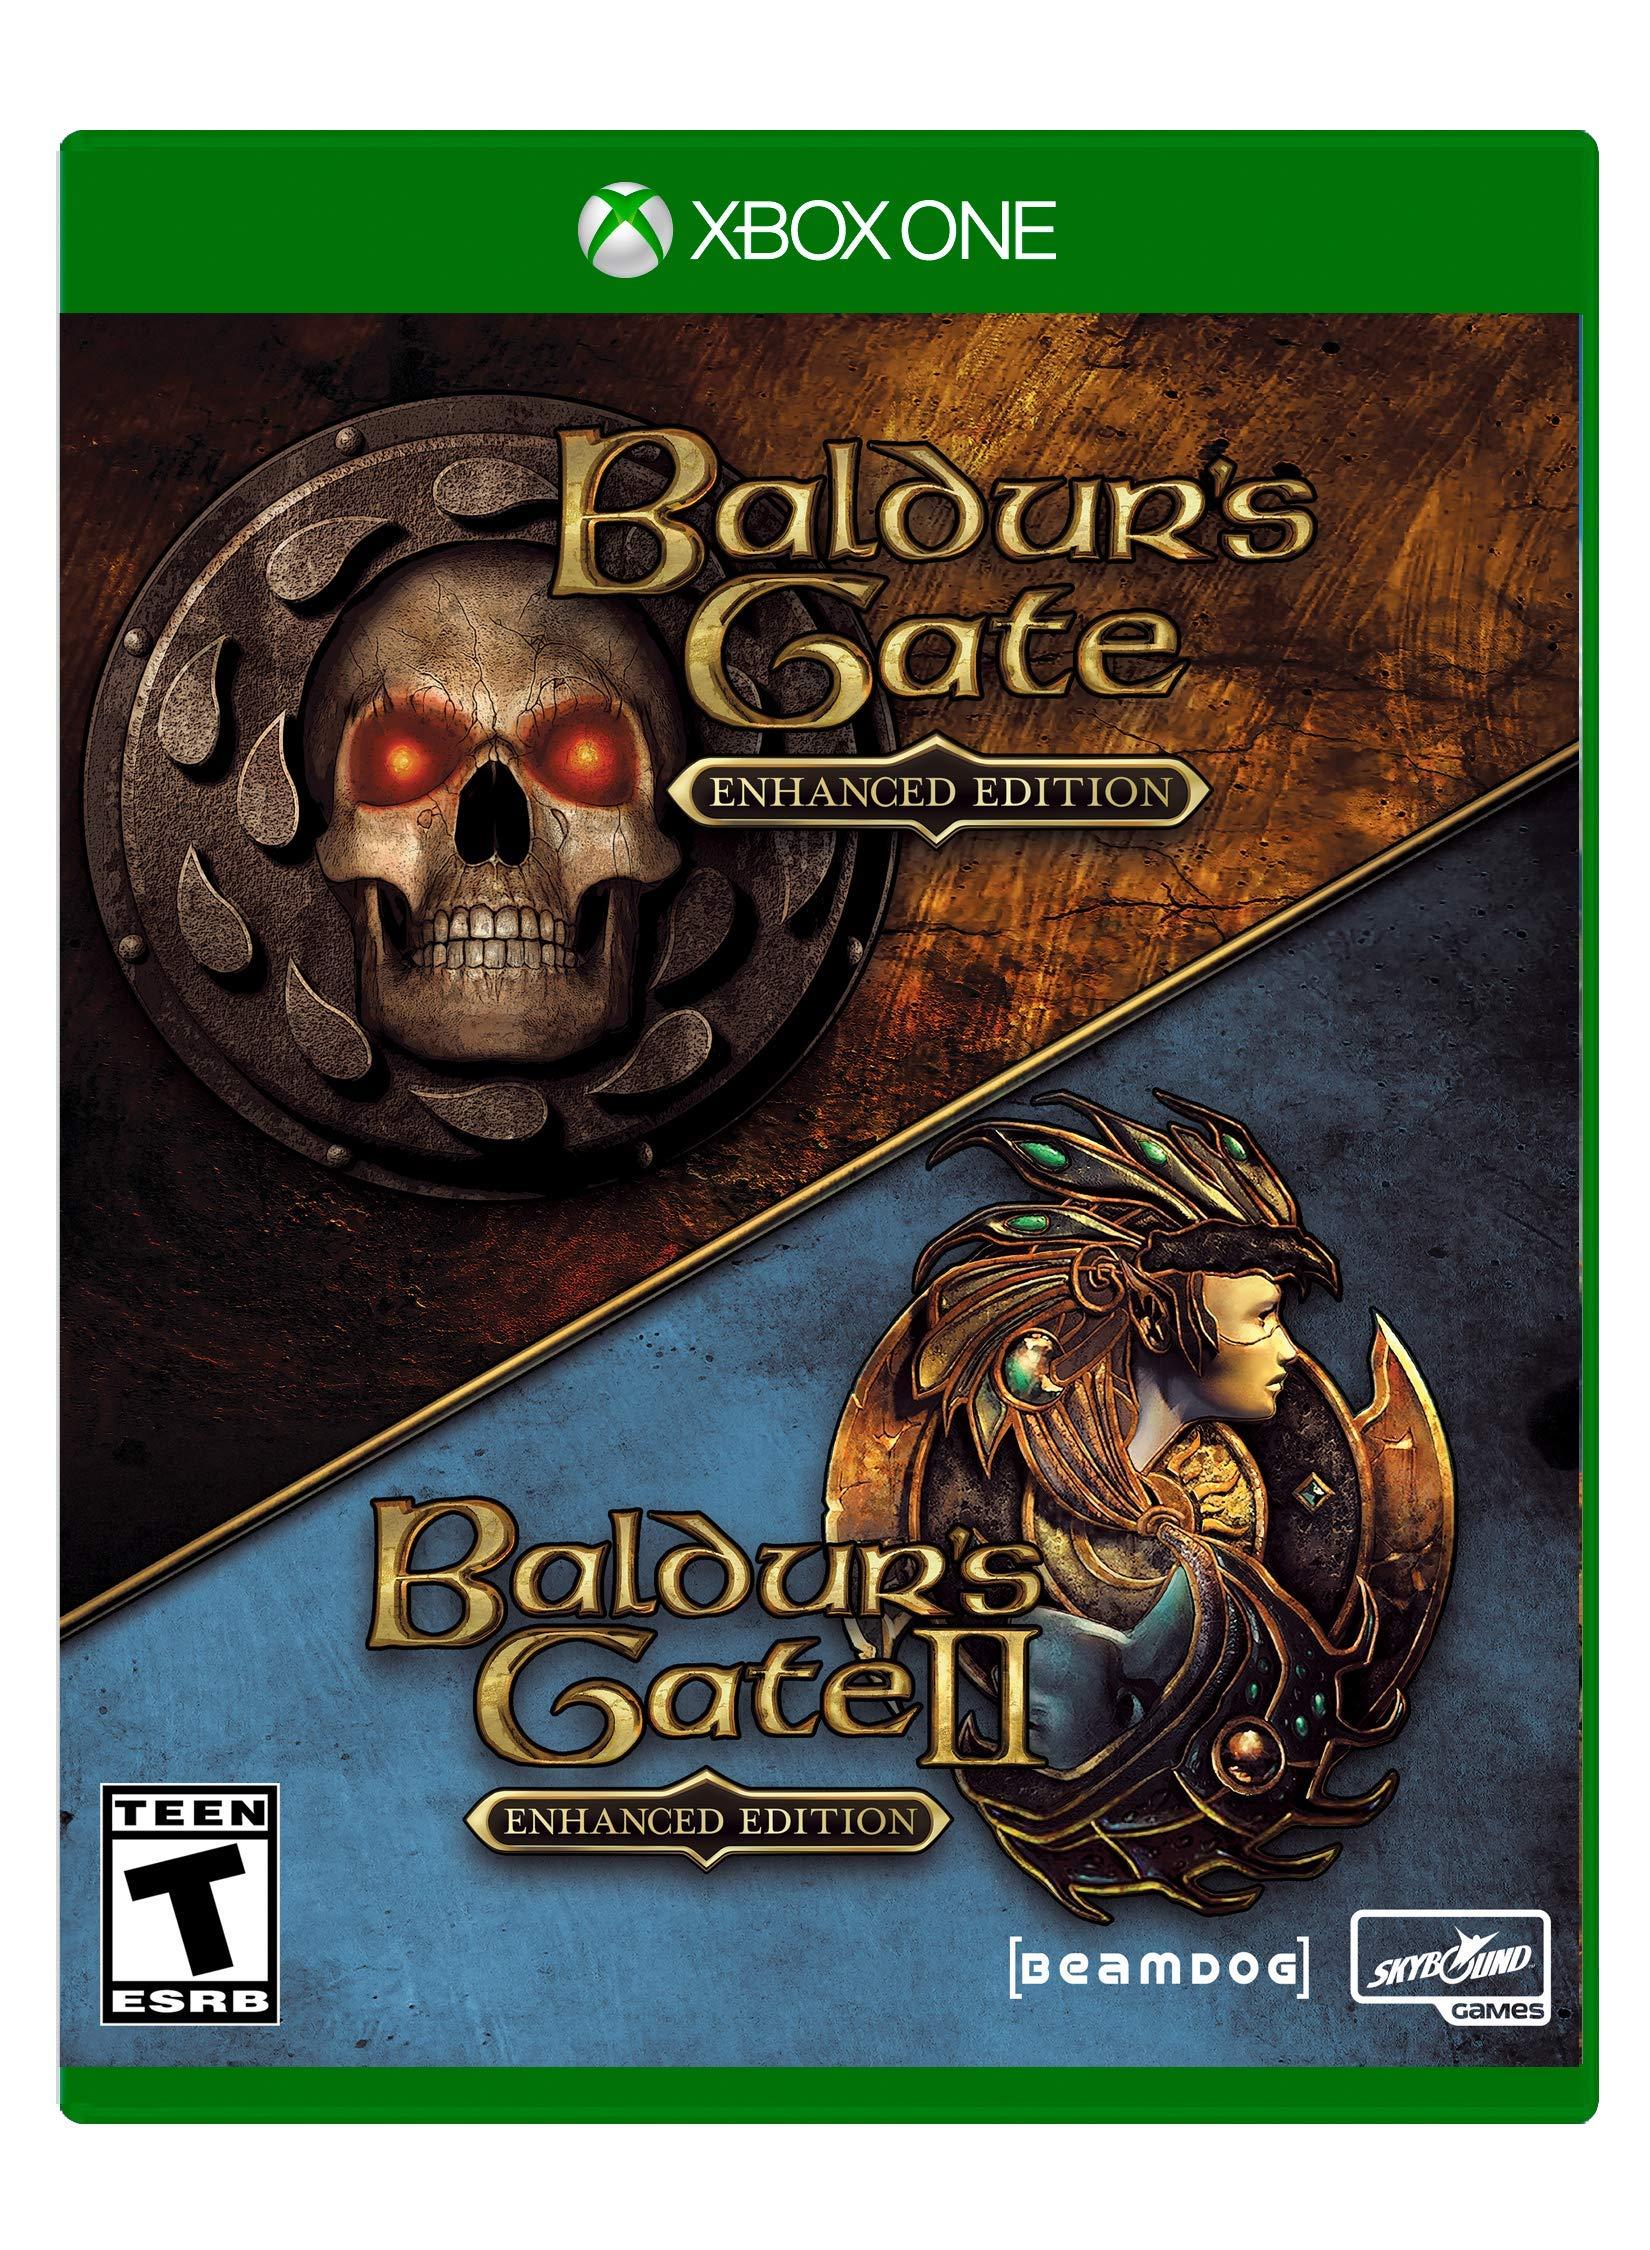 Baldur's Gate - Xbox One Enhanced Edition